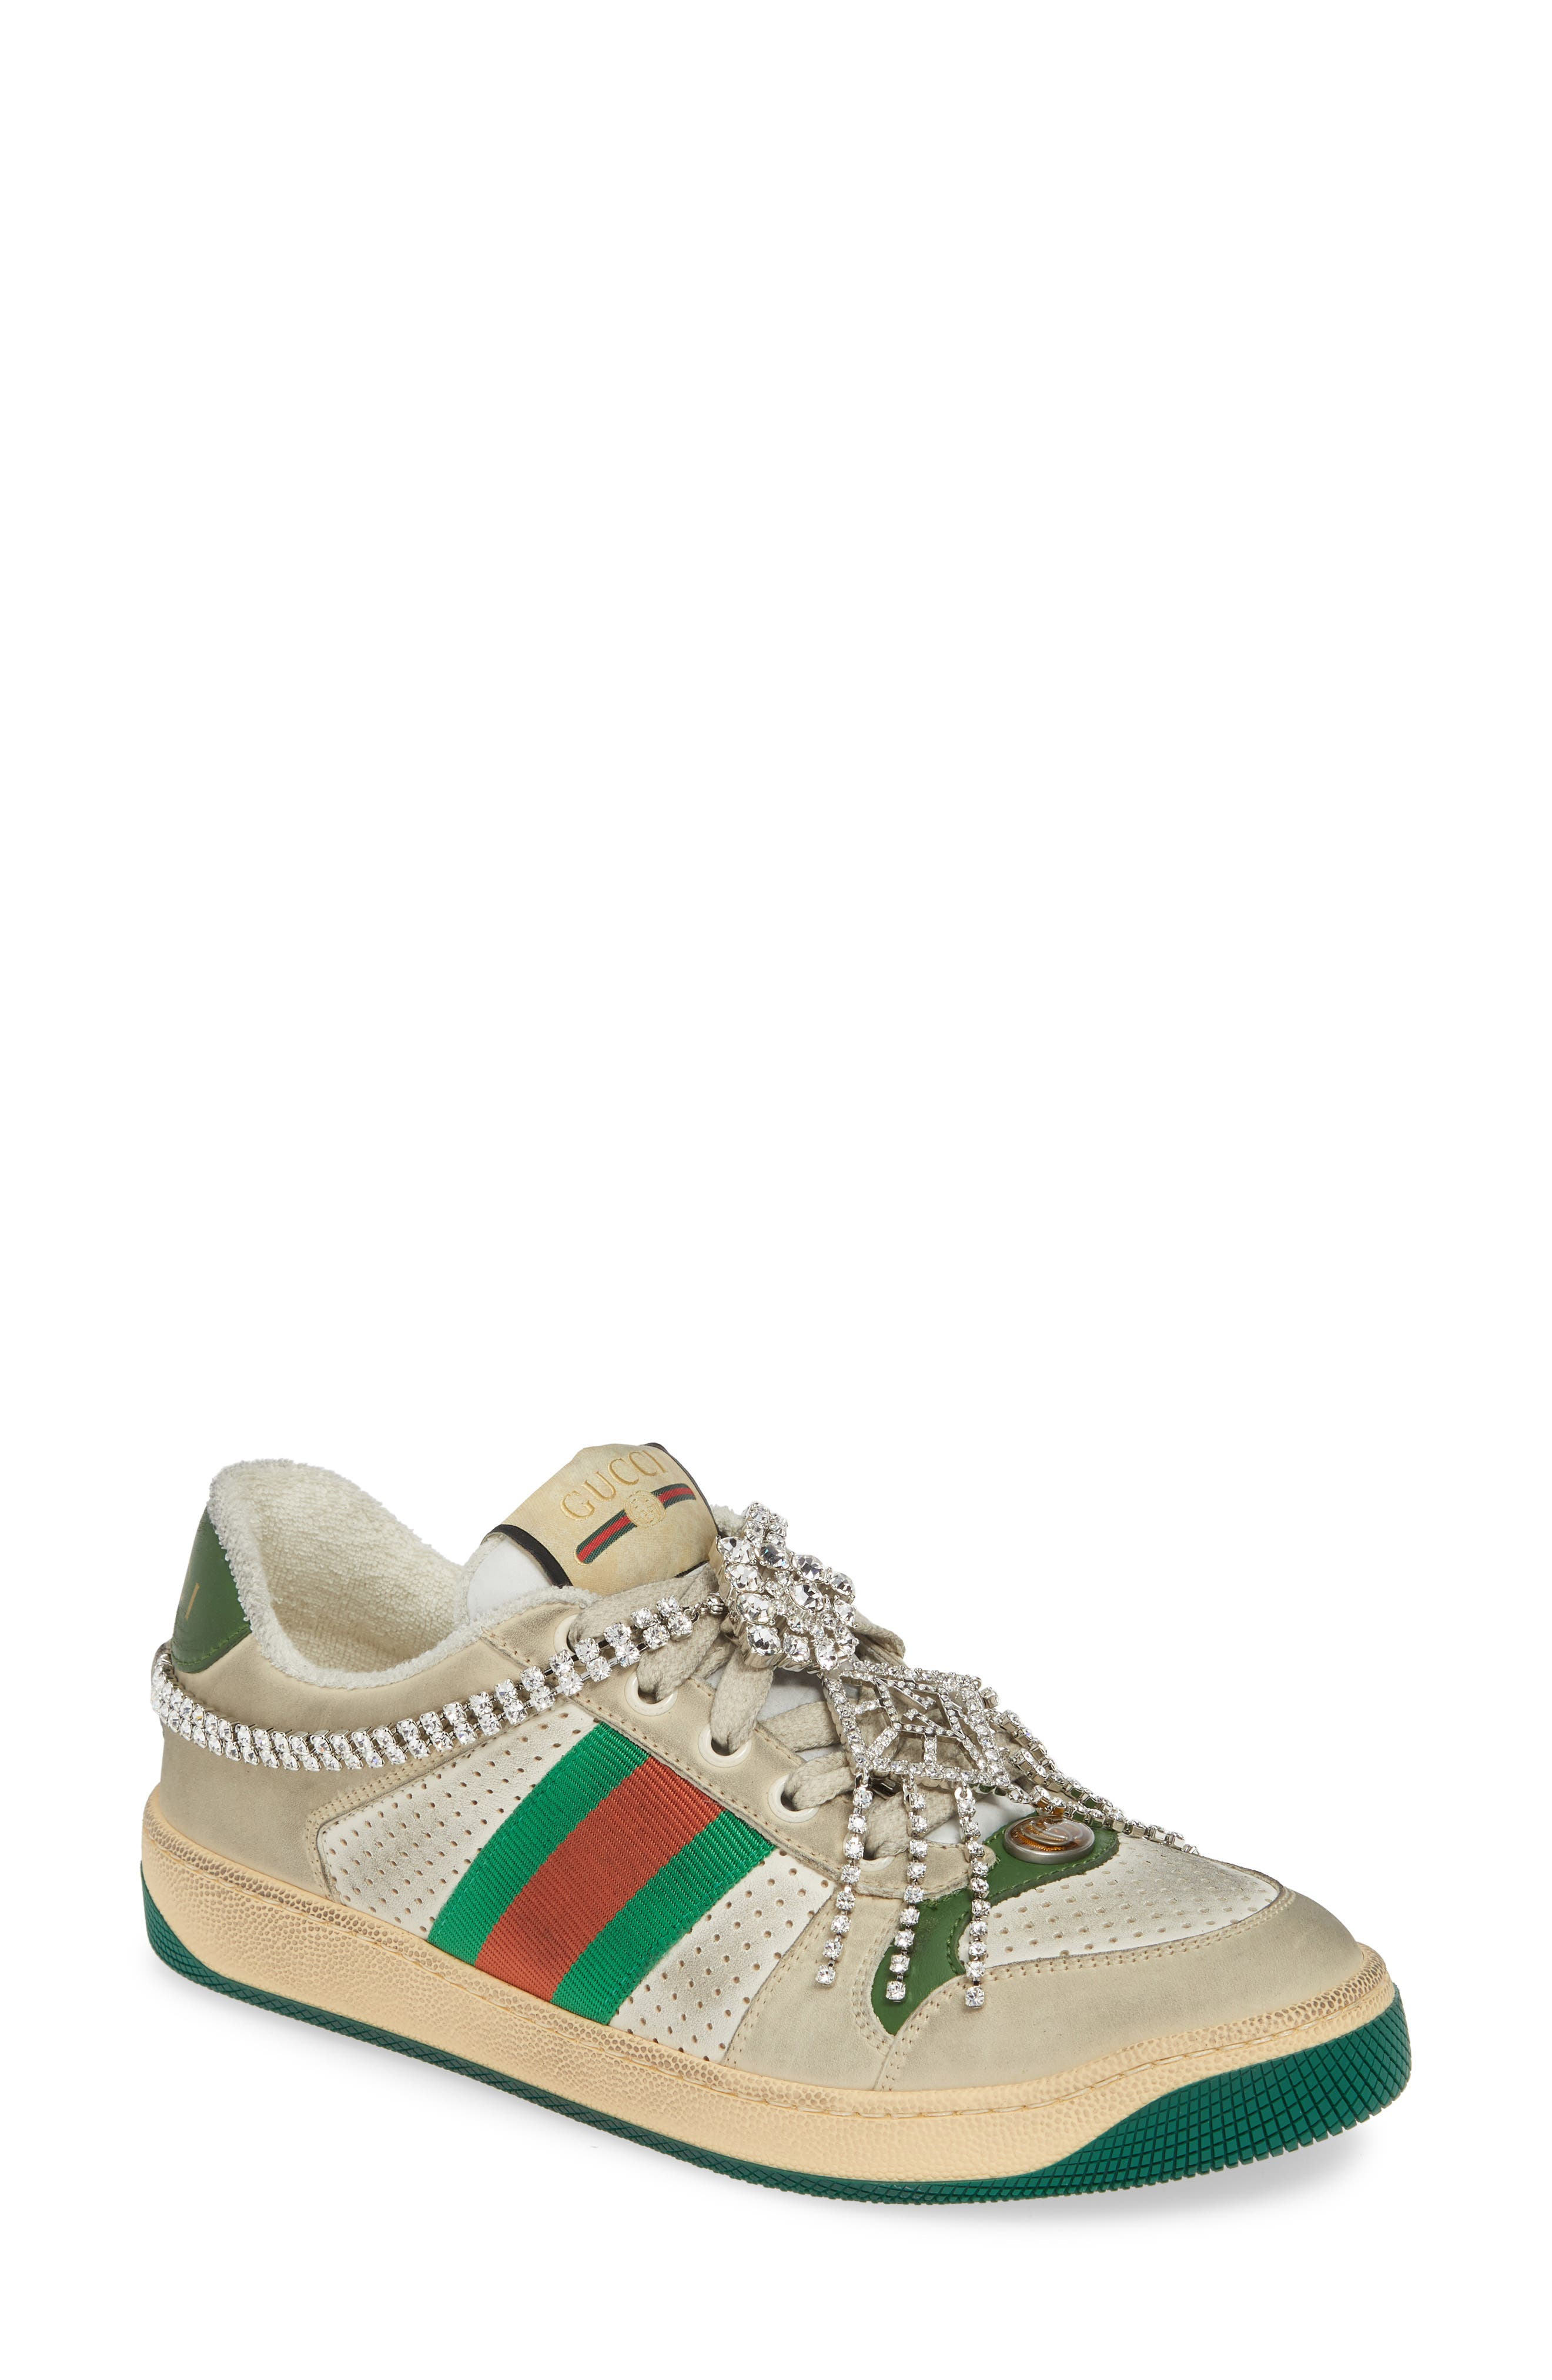 Gucci Screener Jeweled Low Top Sneaker, Beige